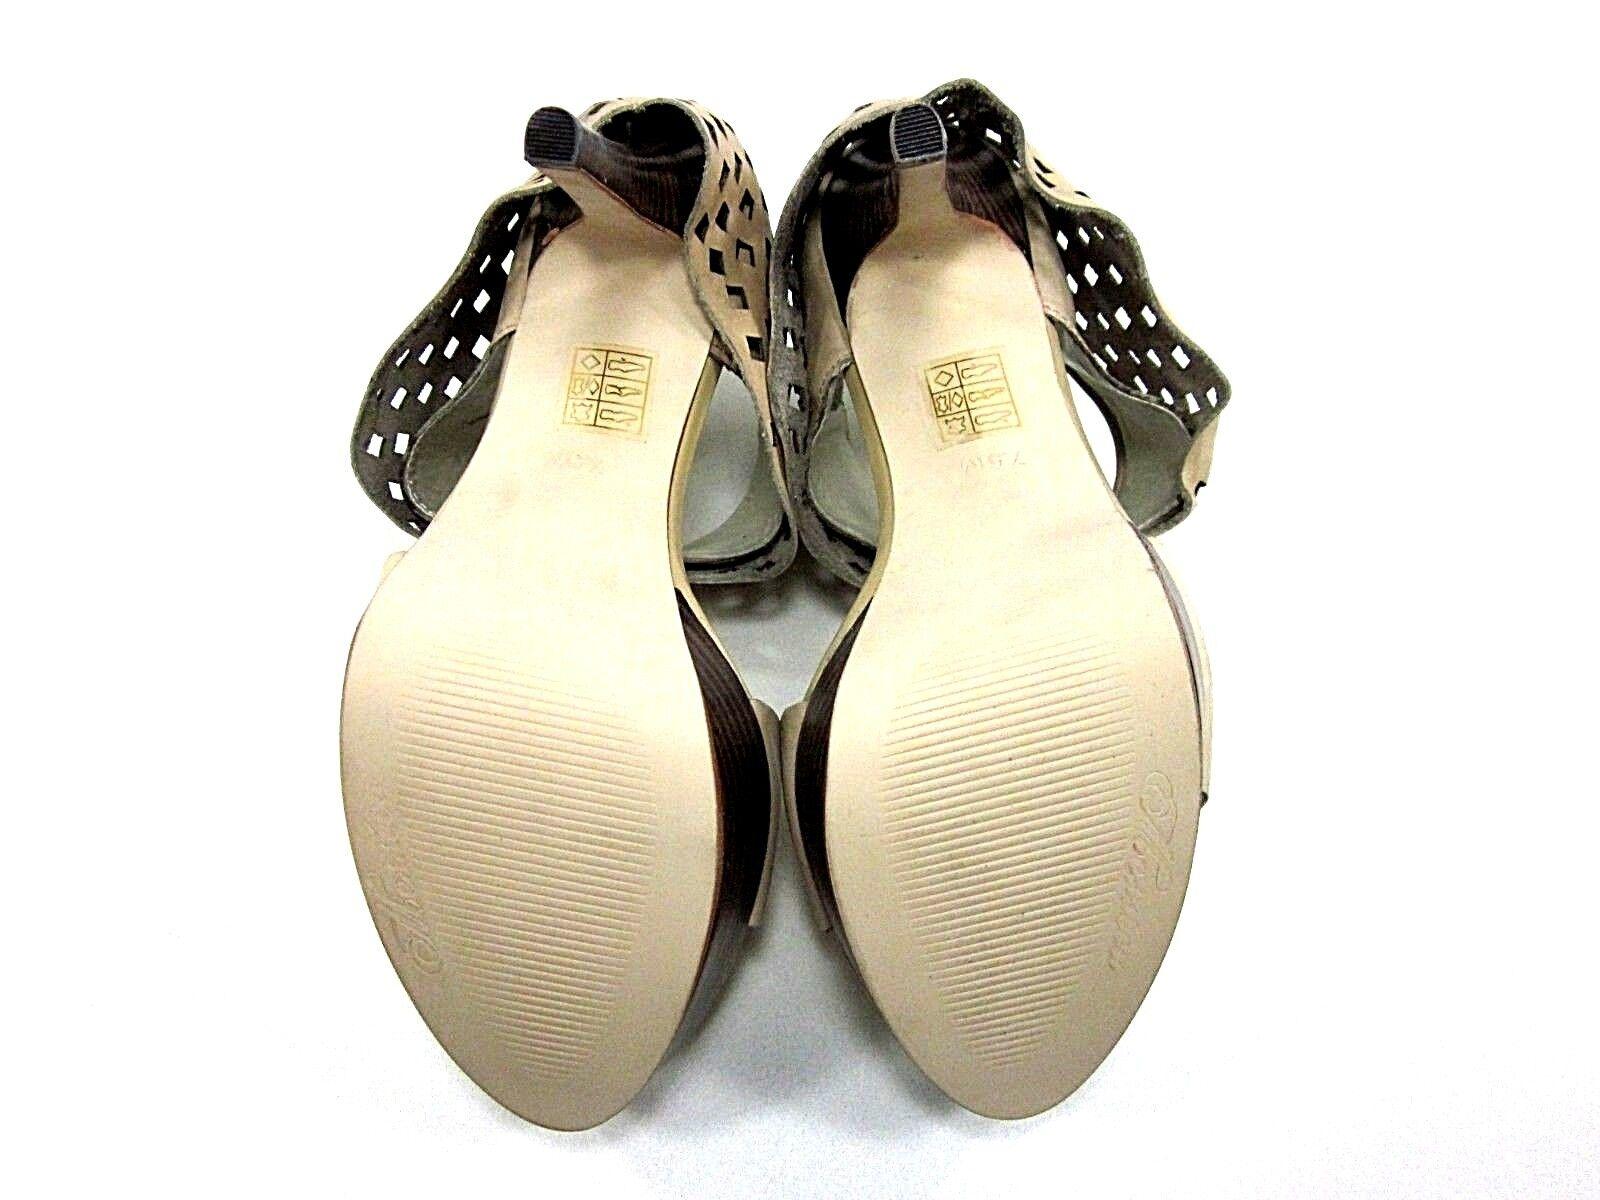 Sandalia tamaño de plataforma para mujer Ember MESSECA, desnuda, US tamaño Sandalia 7.5, Media, Nuevo Exhibido e6a7a2